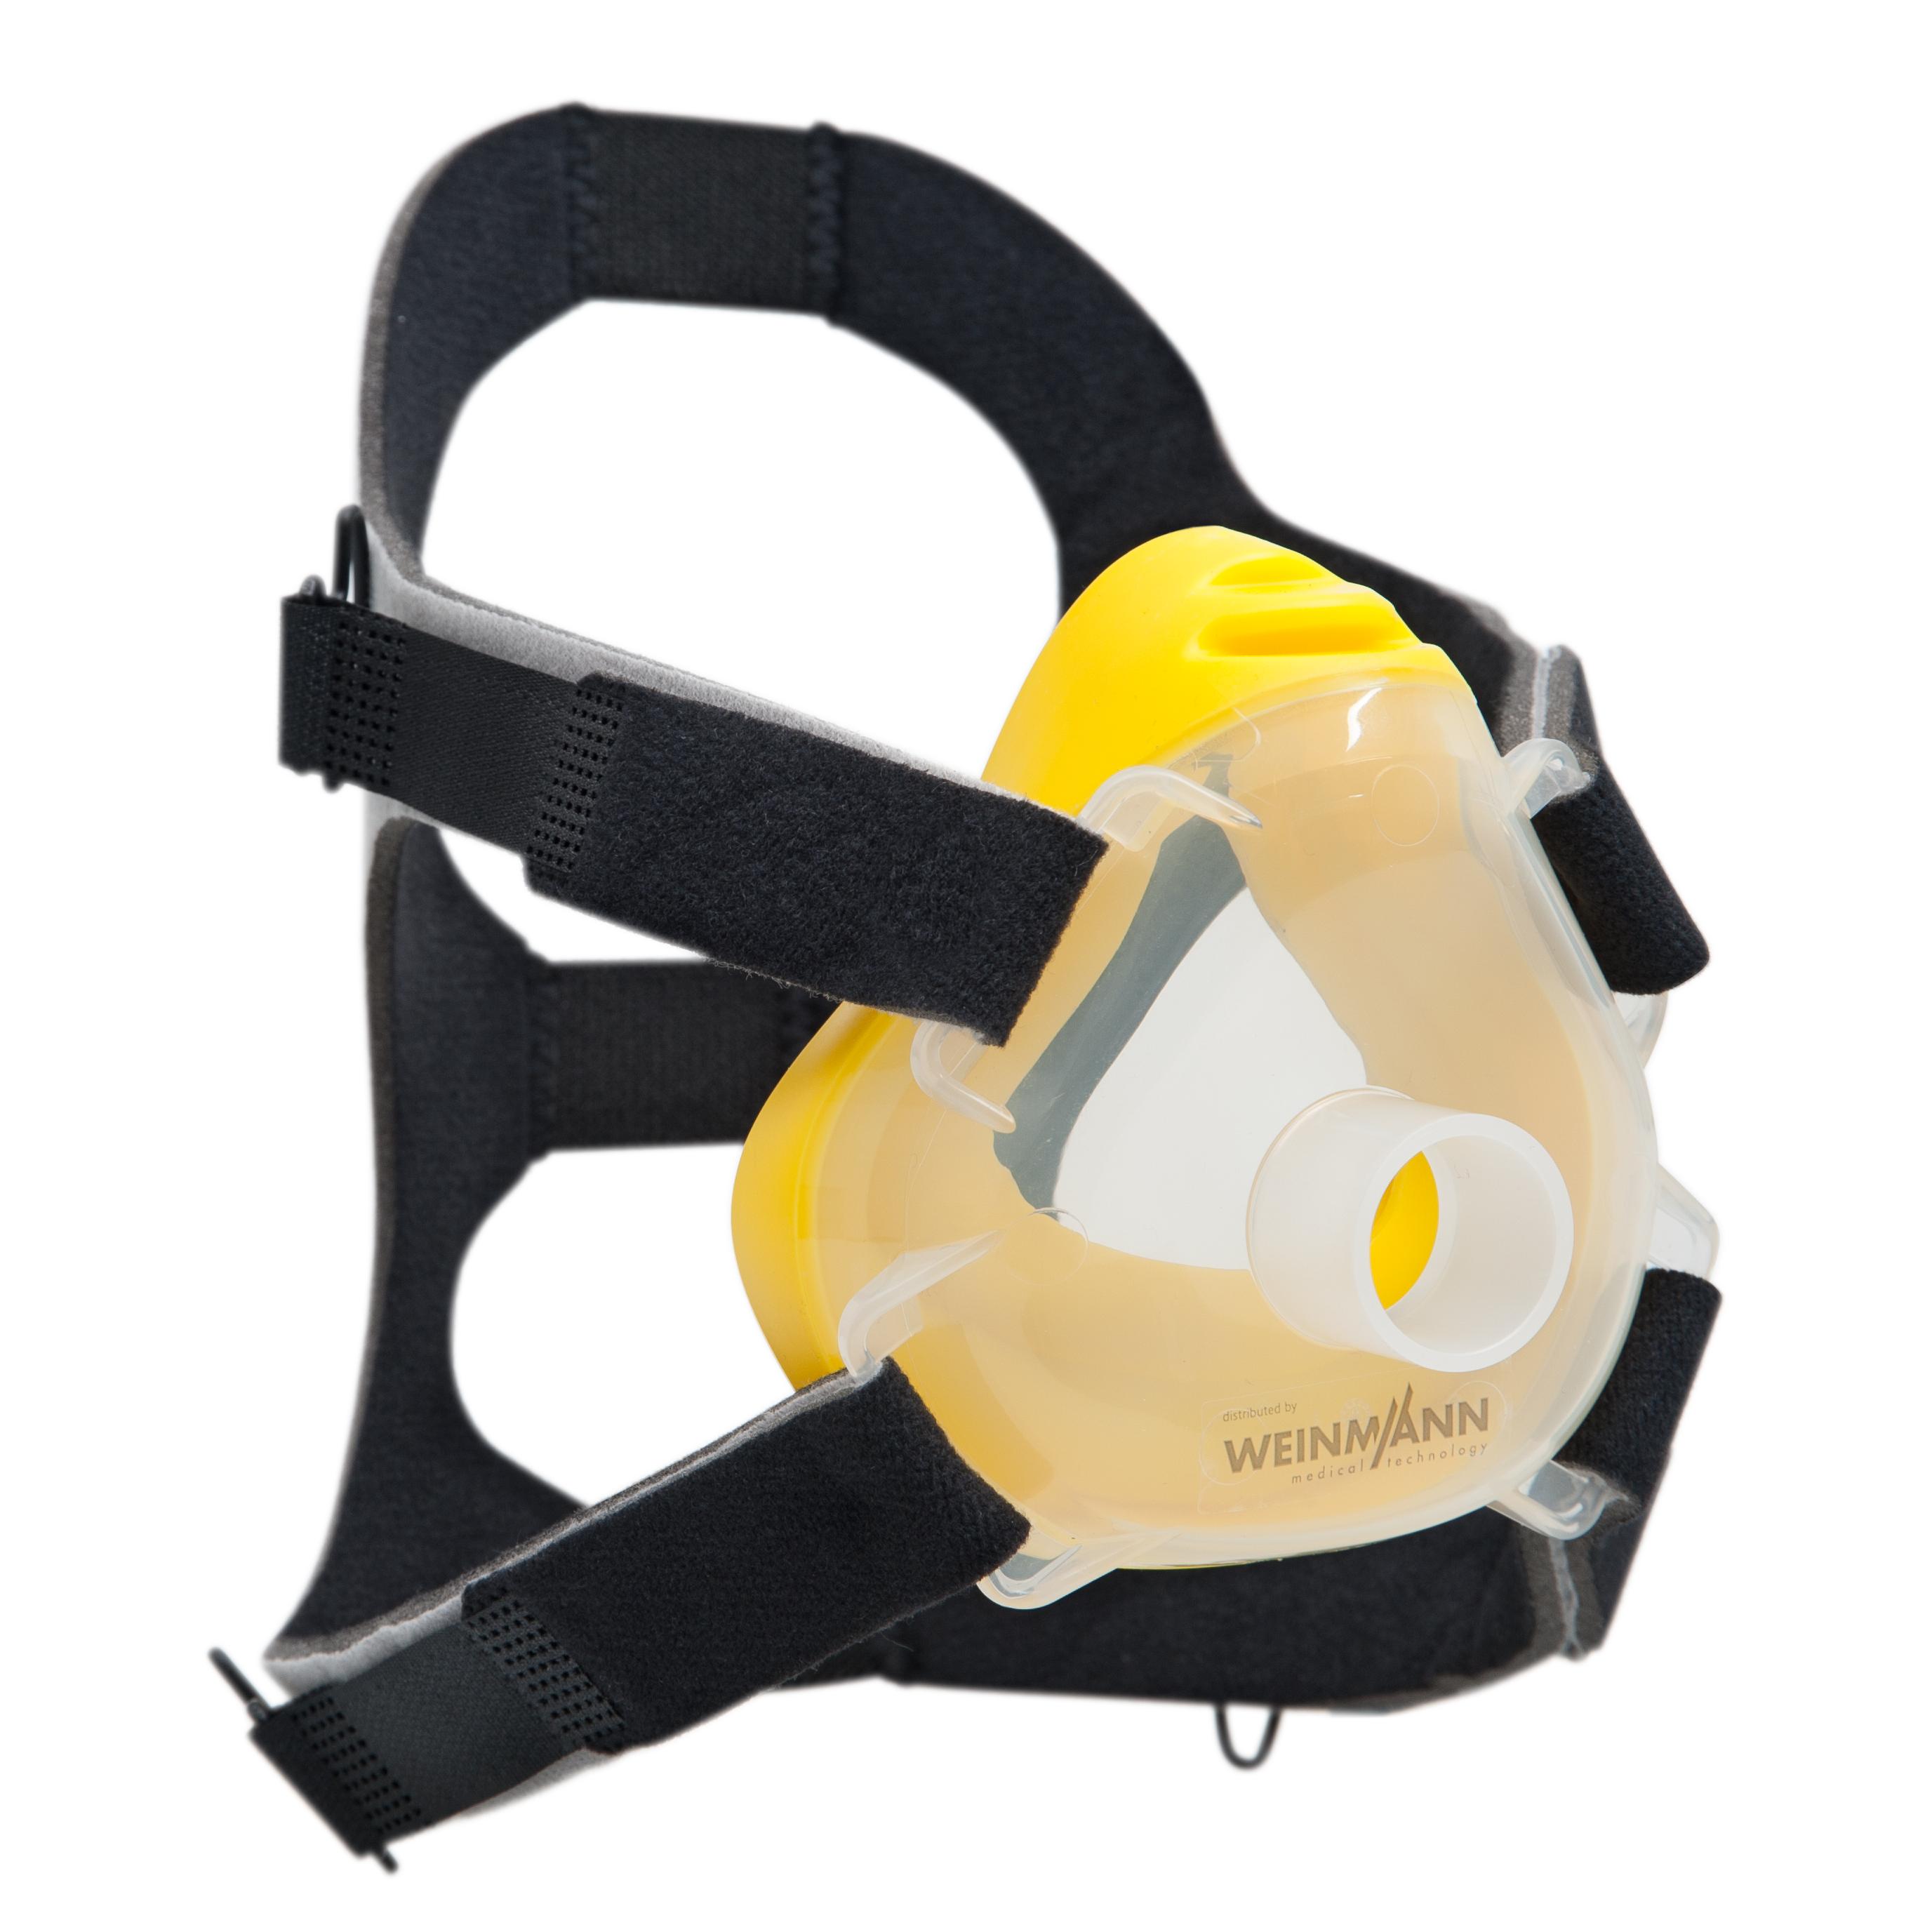 Premium CPAP-/NIV-Einwegmaske inkl. Kopfbänderung  Größe S (Kind), 10er-Set